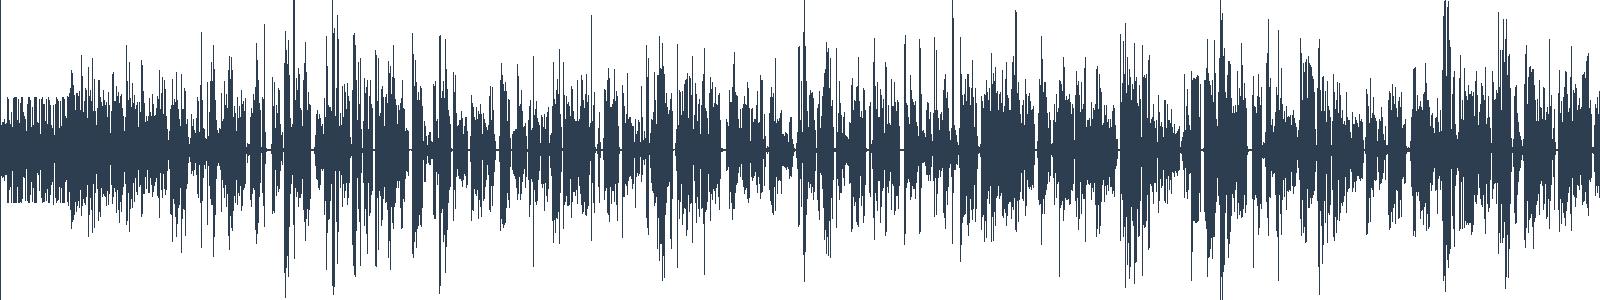 Audinovinky 46 - Pozadu s jednorožci waveform